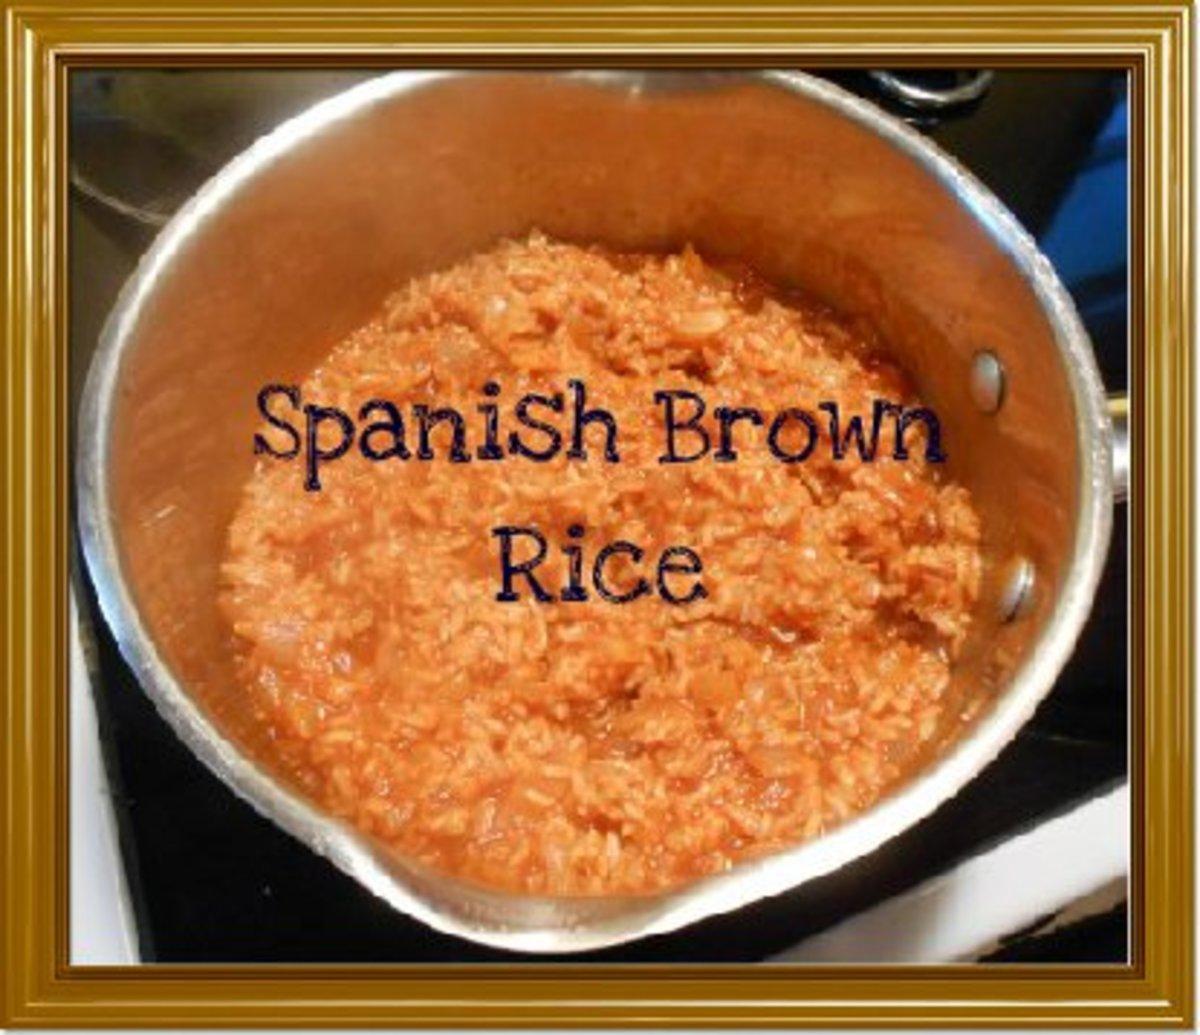 ... rice bake baked brown spanish rice spanish rice casserole spanish rice